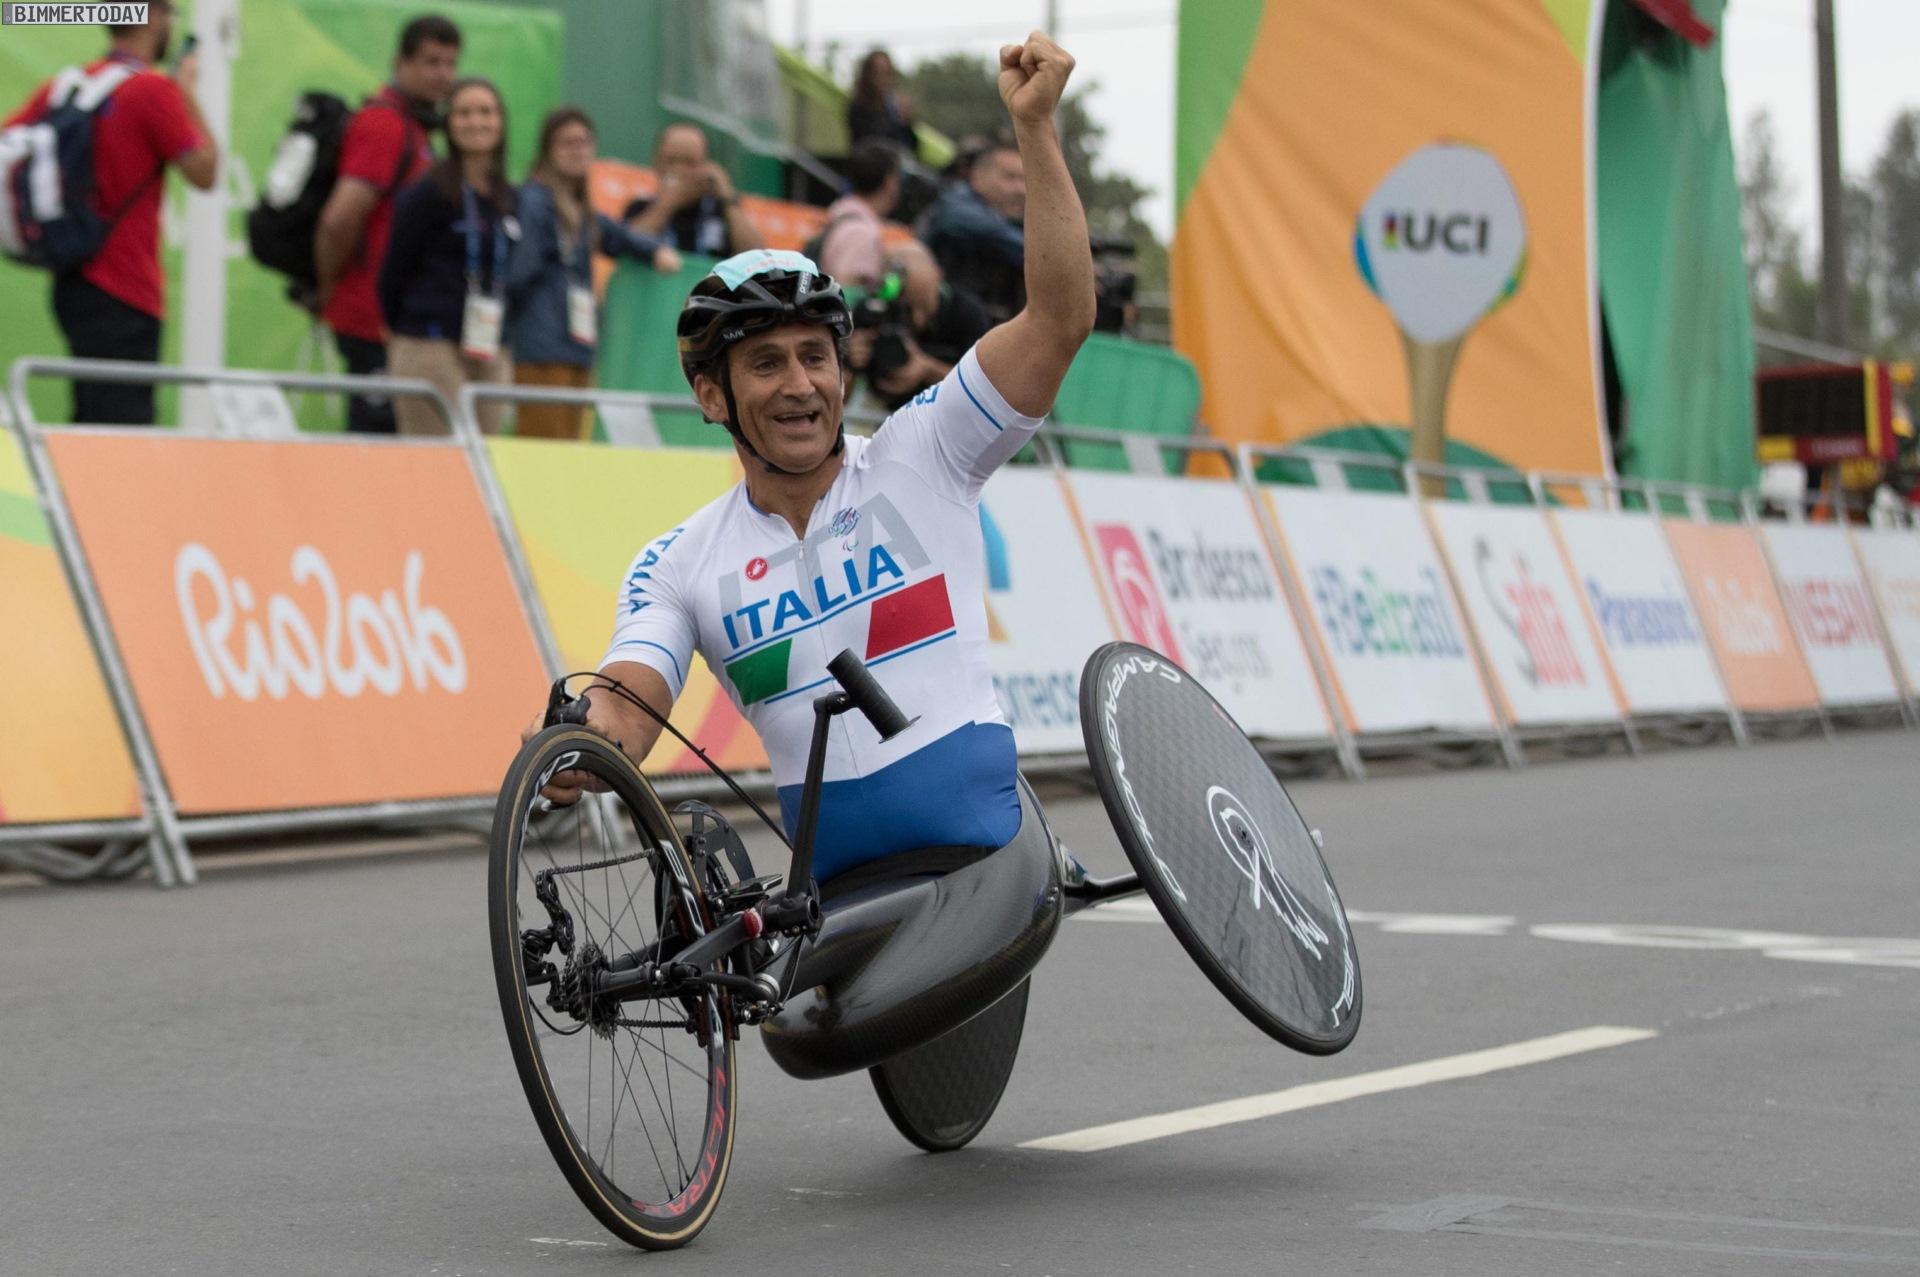 https://cdn.bimmertoday.de/wp-content/uploads/2016/09/Alessandro-Zanardi-Paralympics-Rio-2016-Staffel-07.jpg